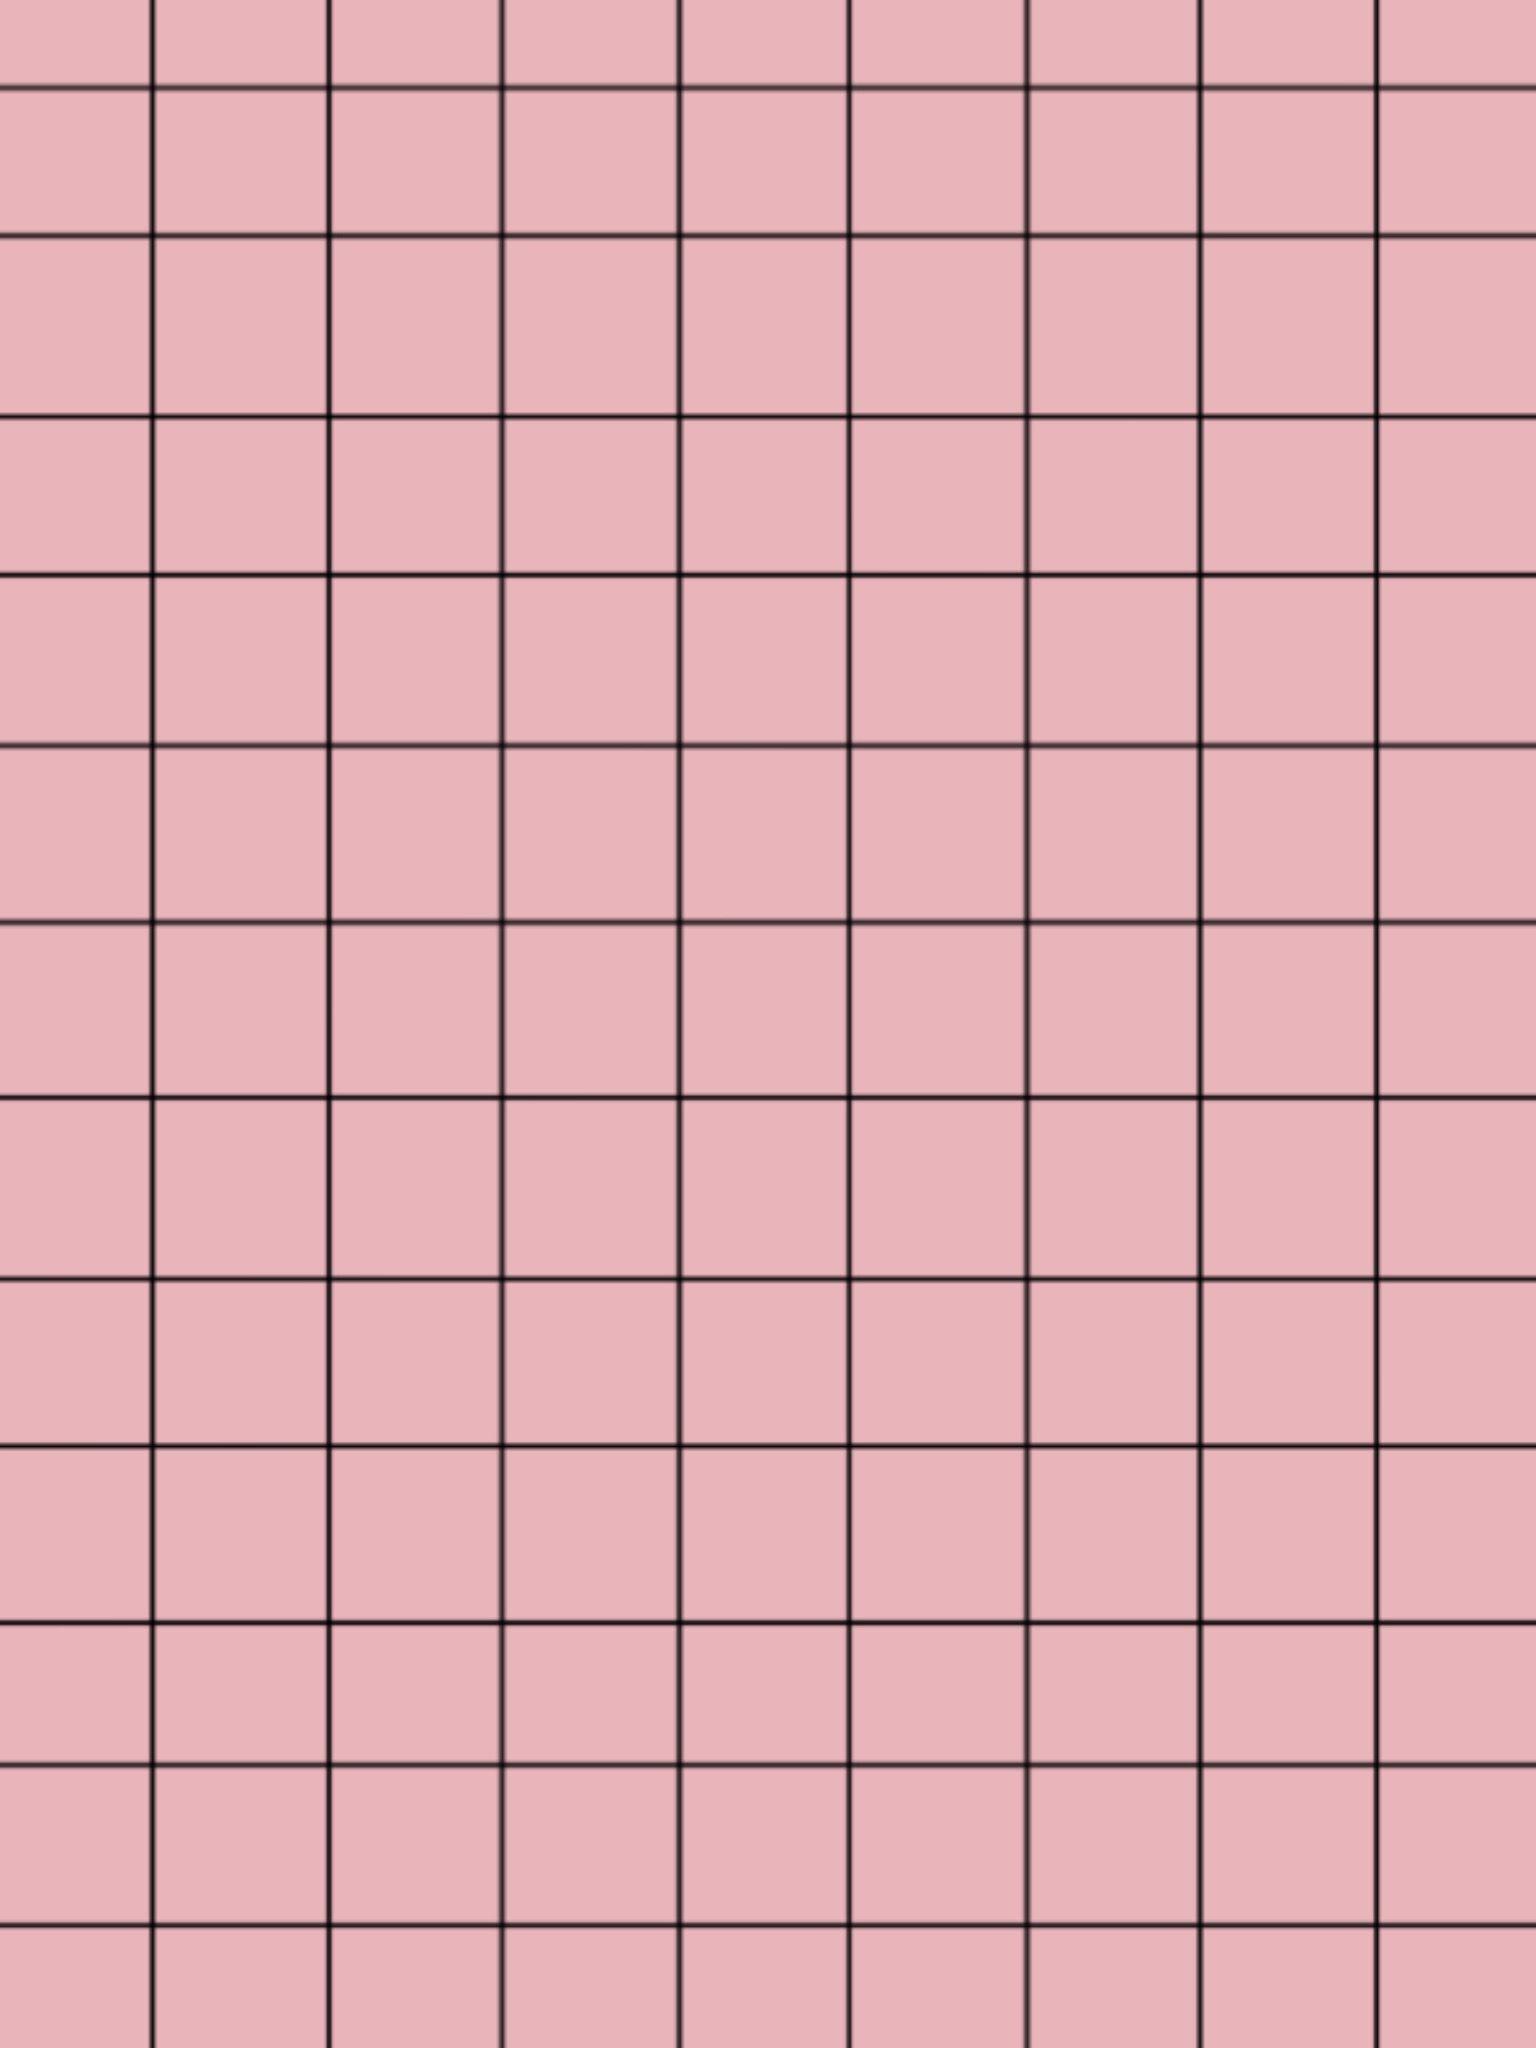 Pink Aesthetic Grid Wallpapers   Top Pink Aesthetic Grid 1536x2048